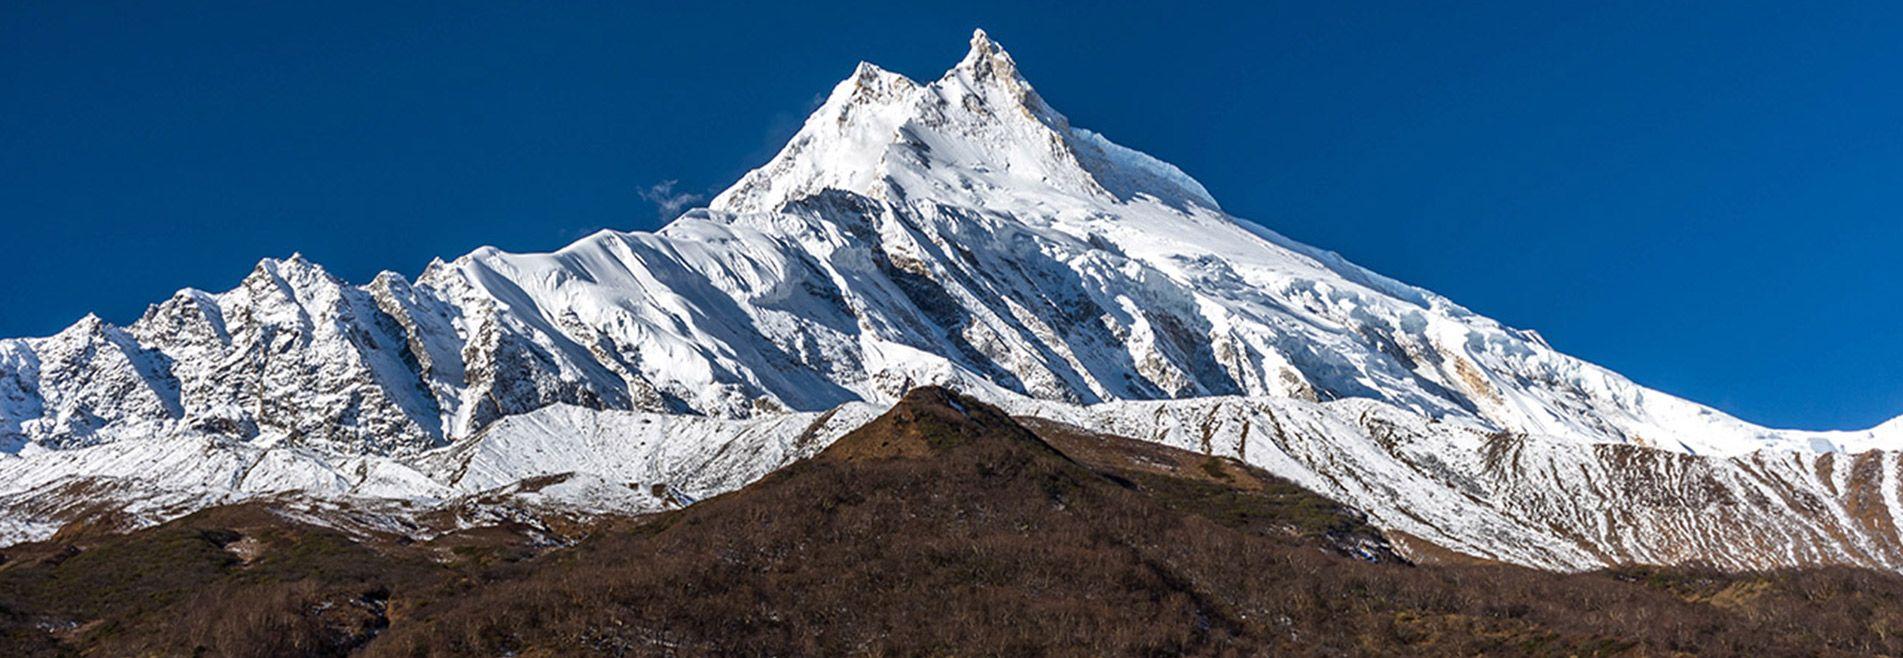 Manaslu Peak Climbing